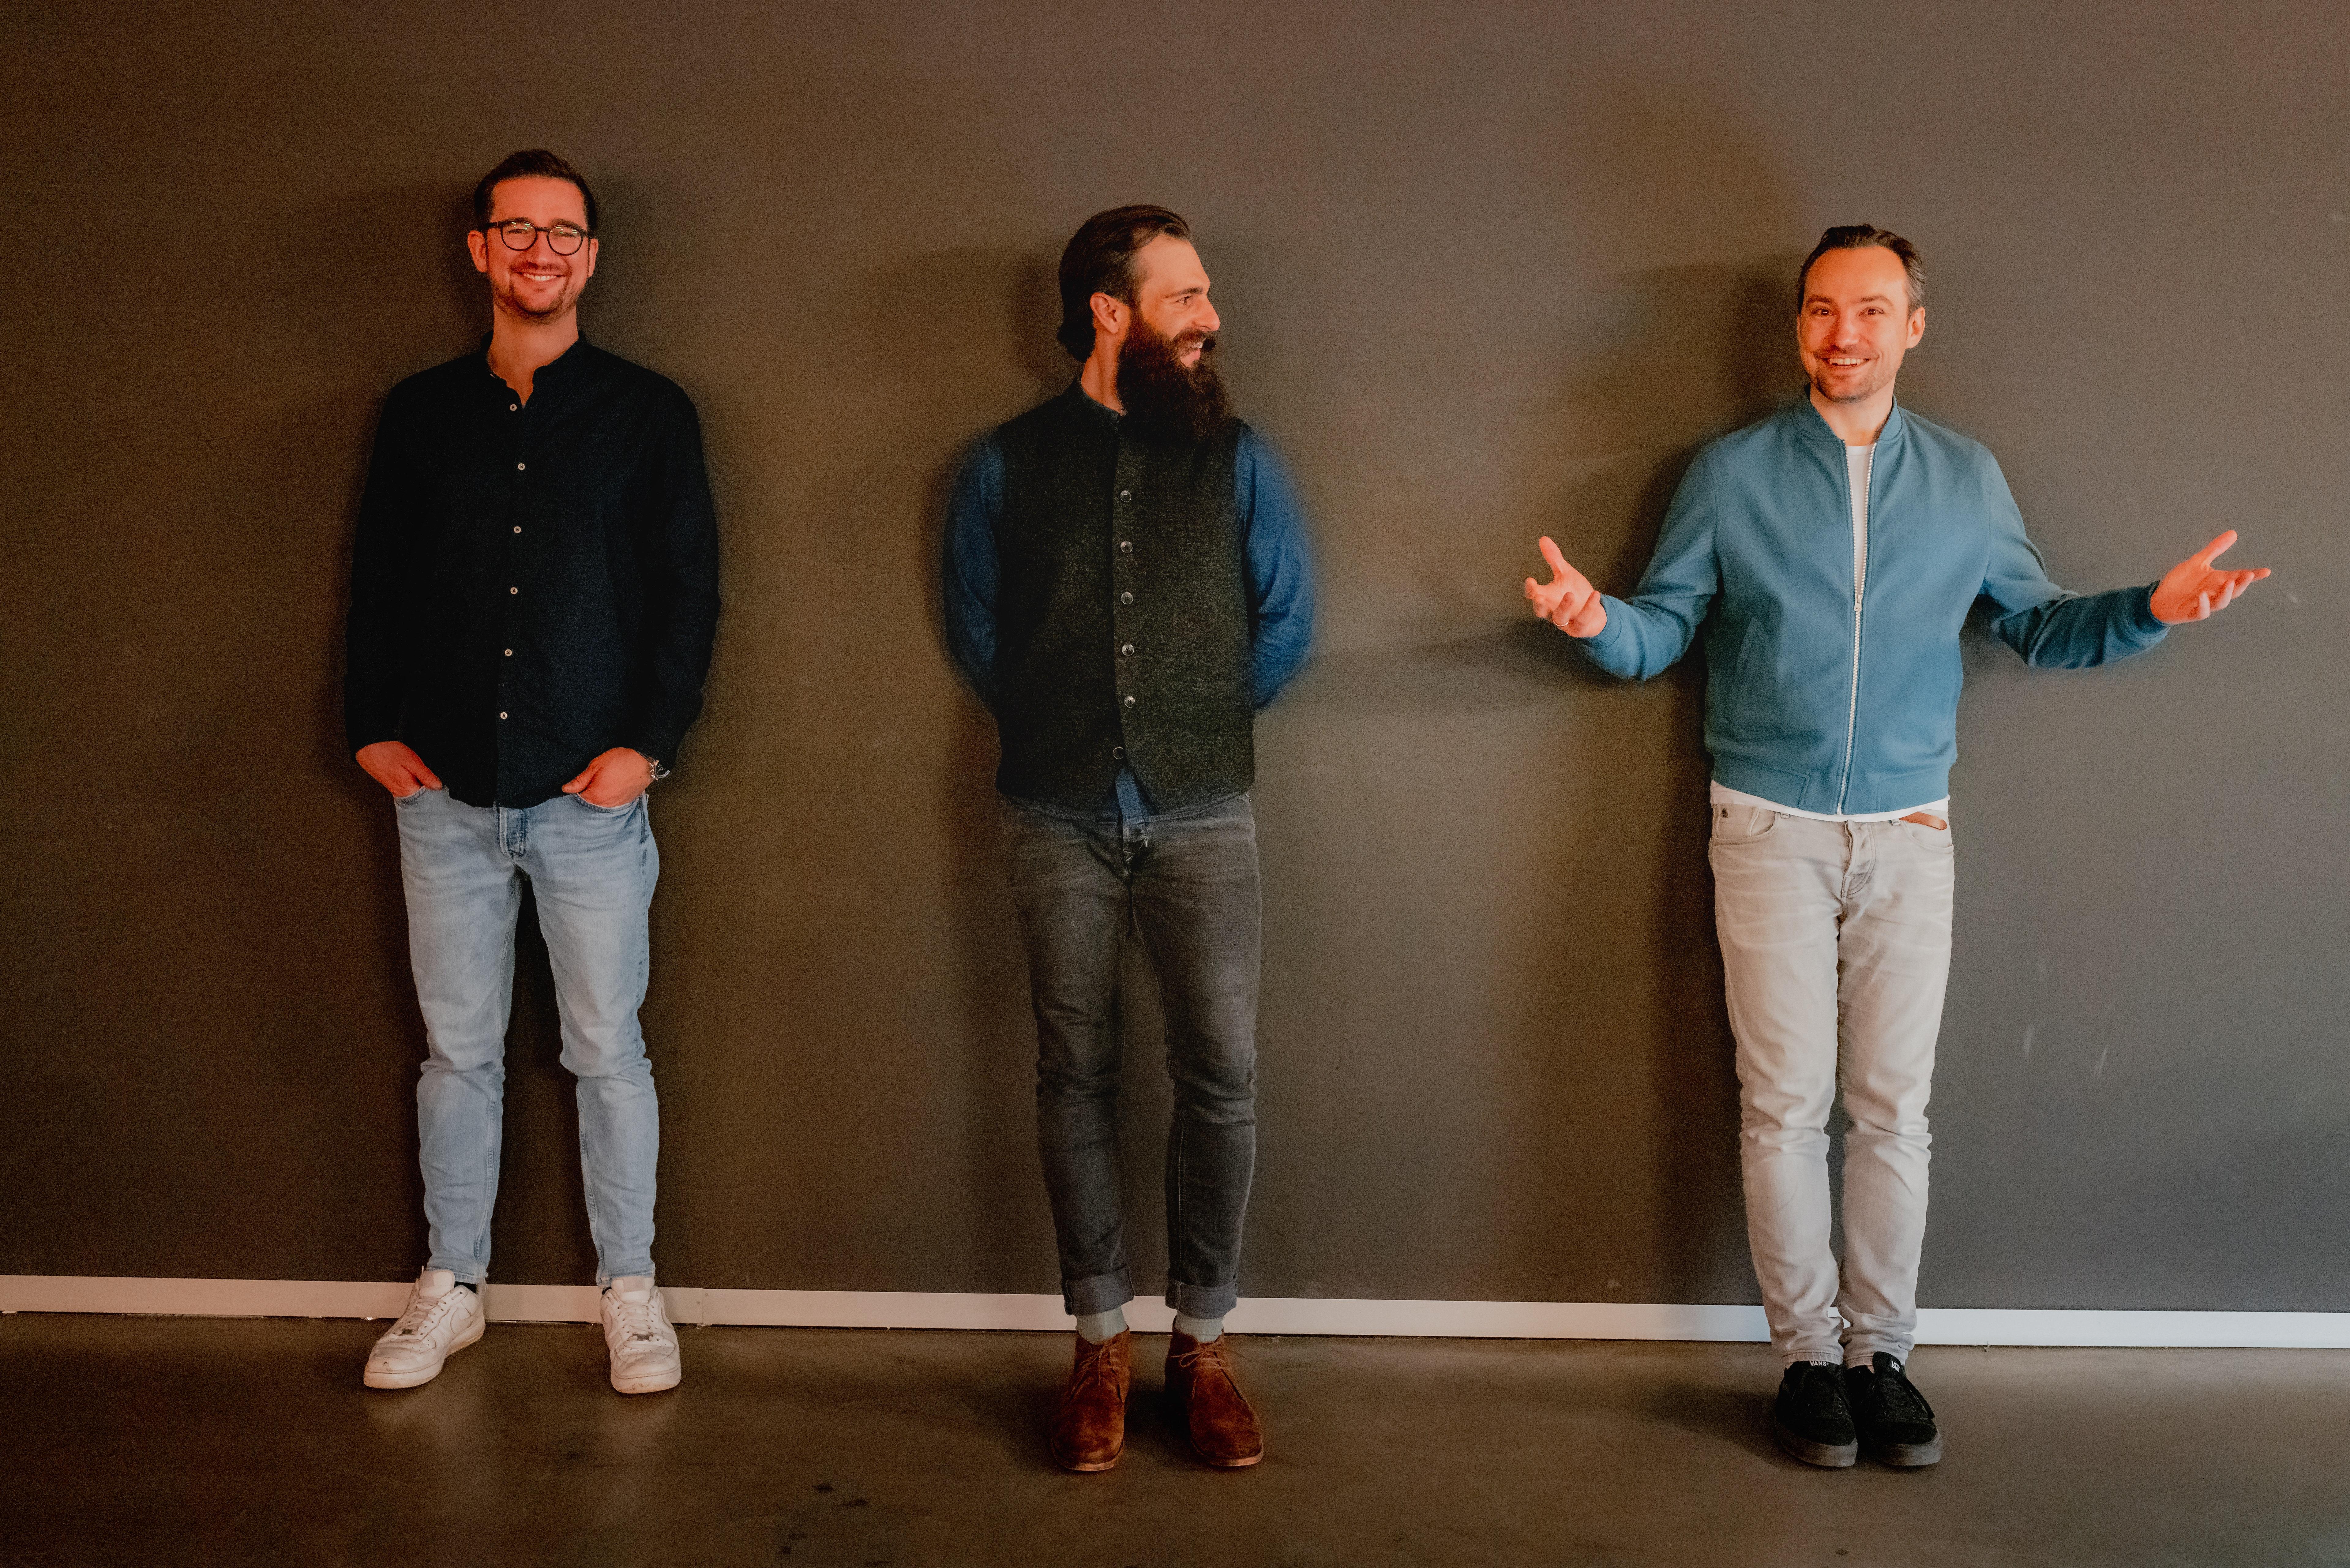 Gründerfoto mit Dimitri, Dominik und Andreas